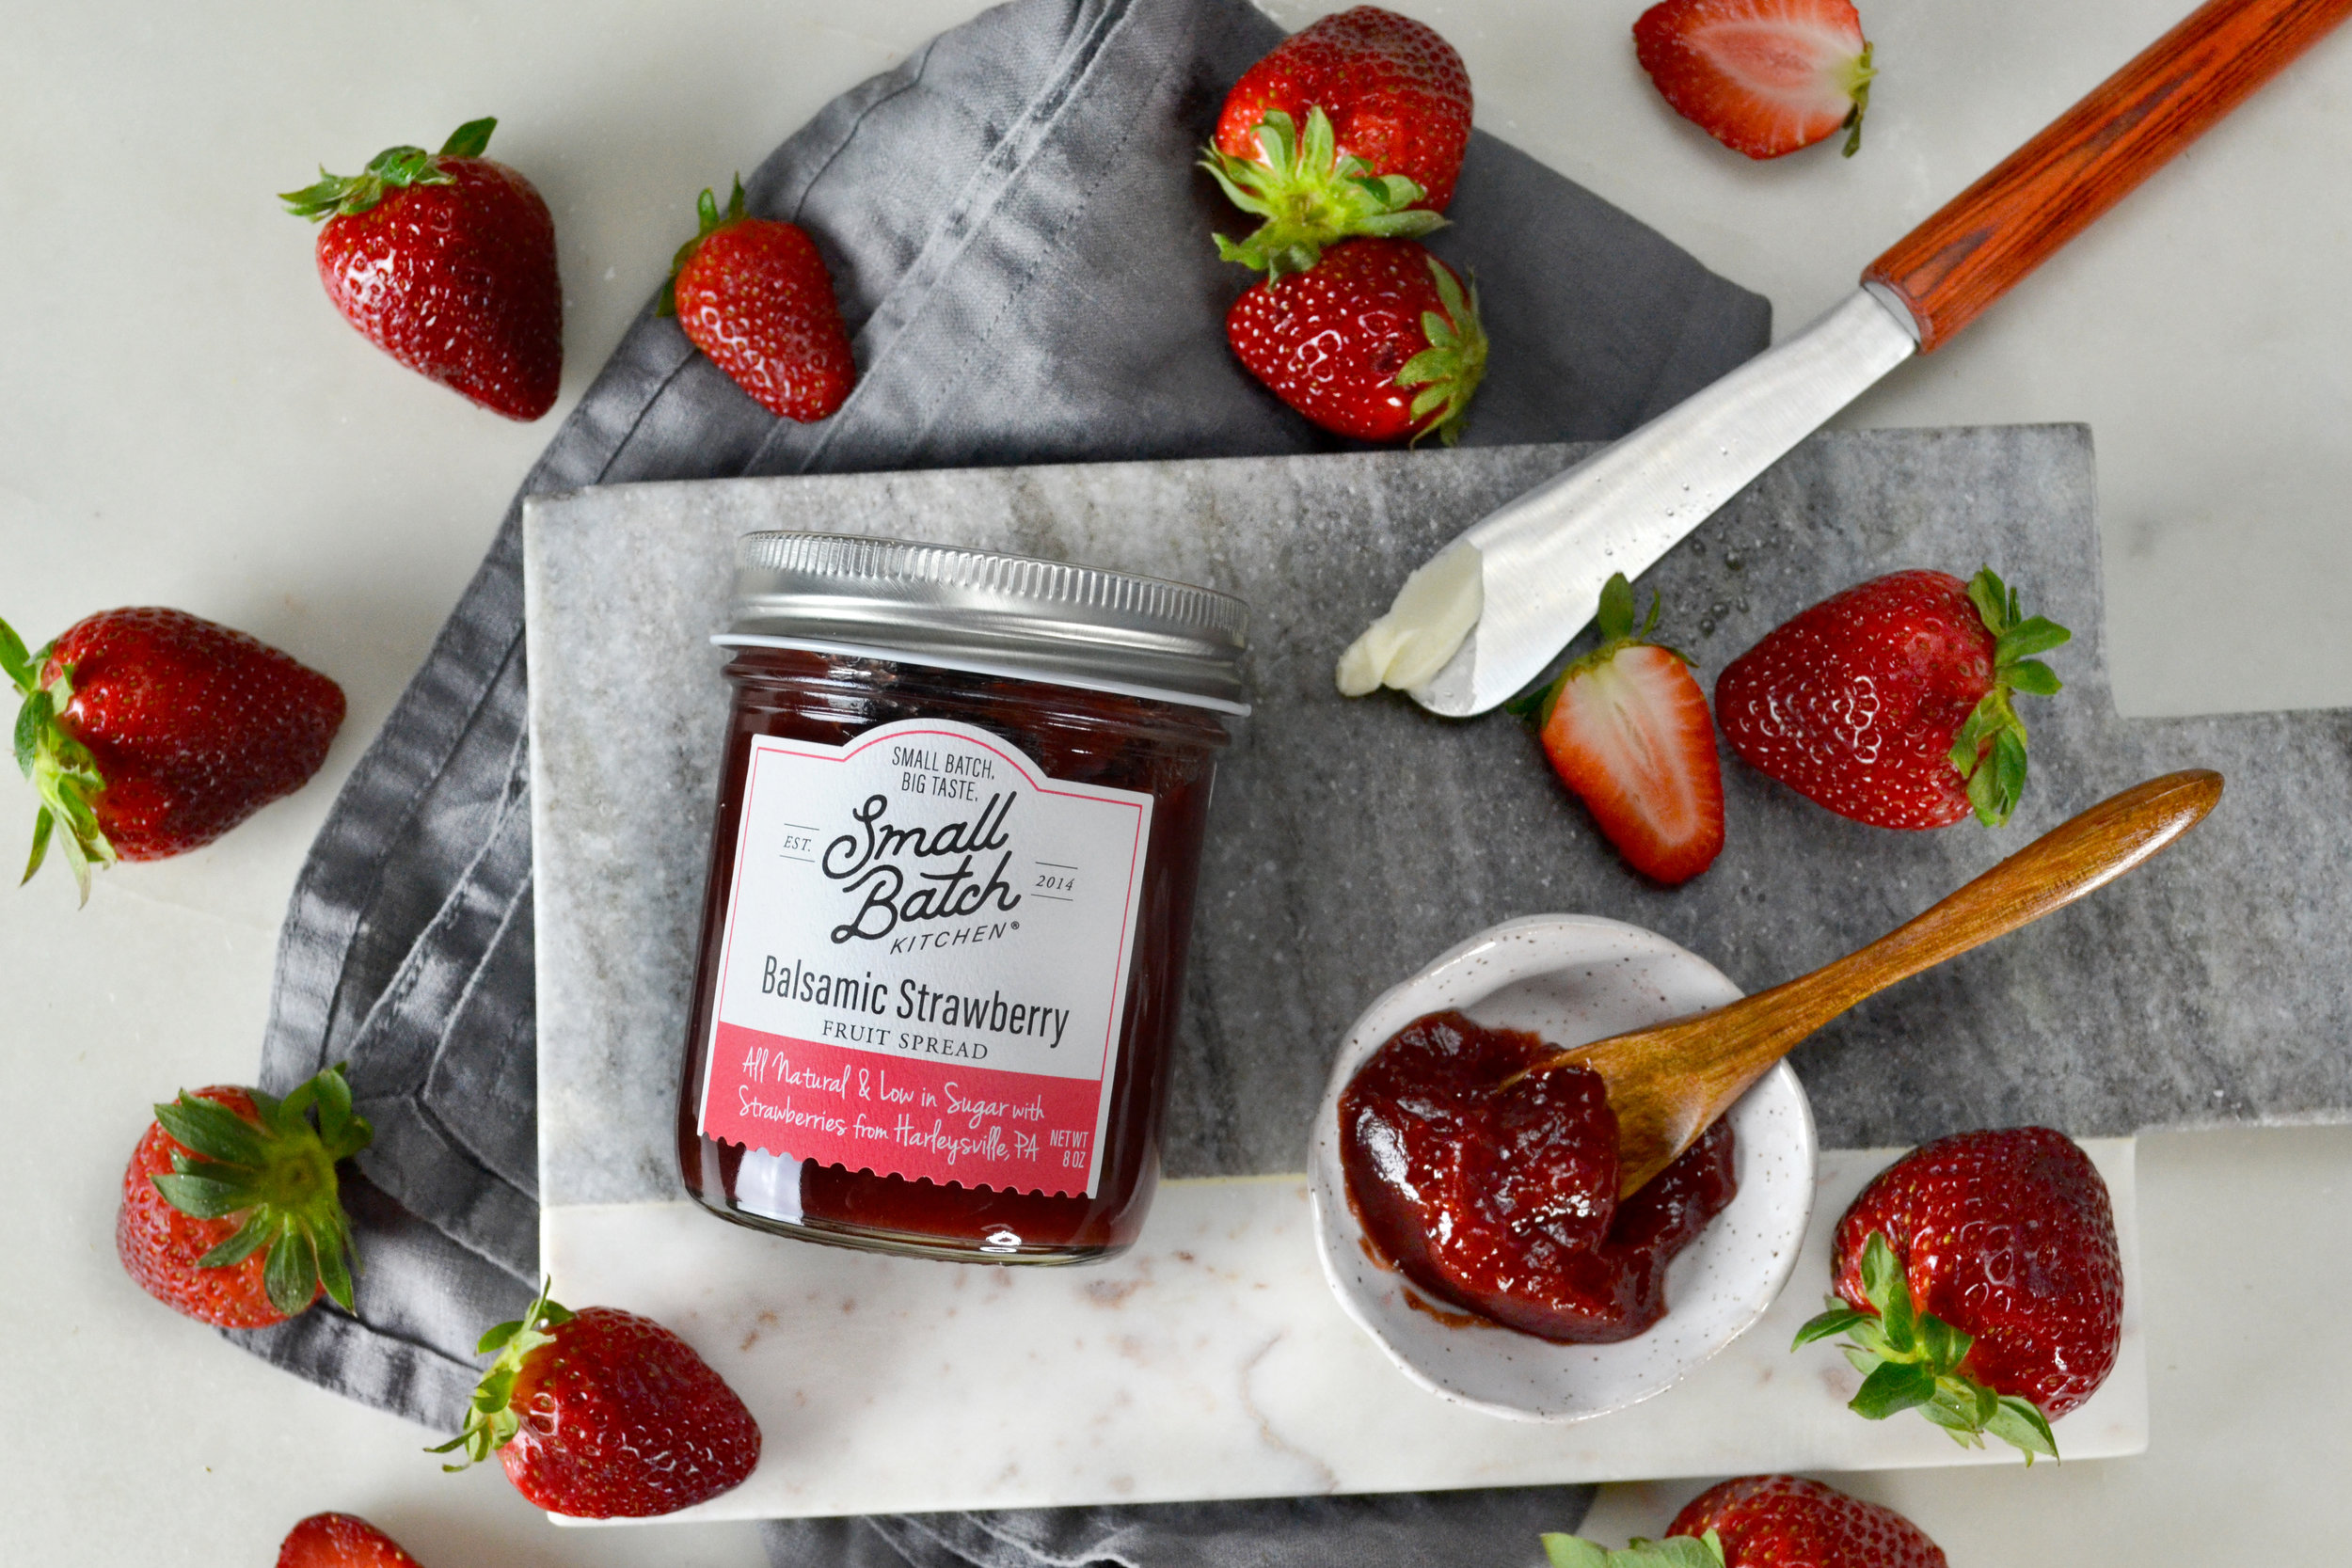 Balsamic Strawberry Fruit Spread